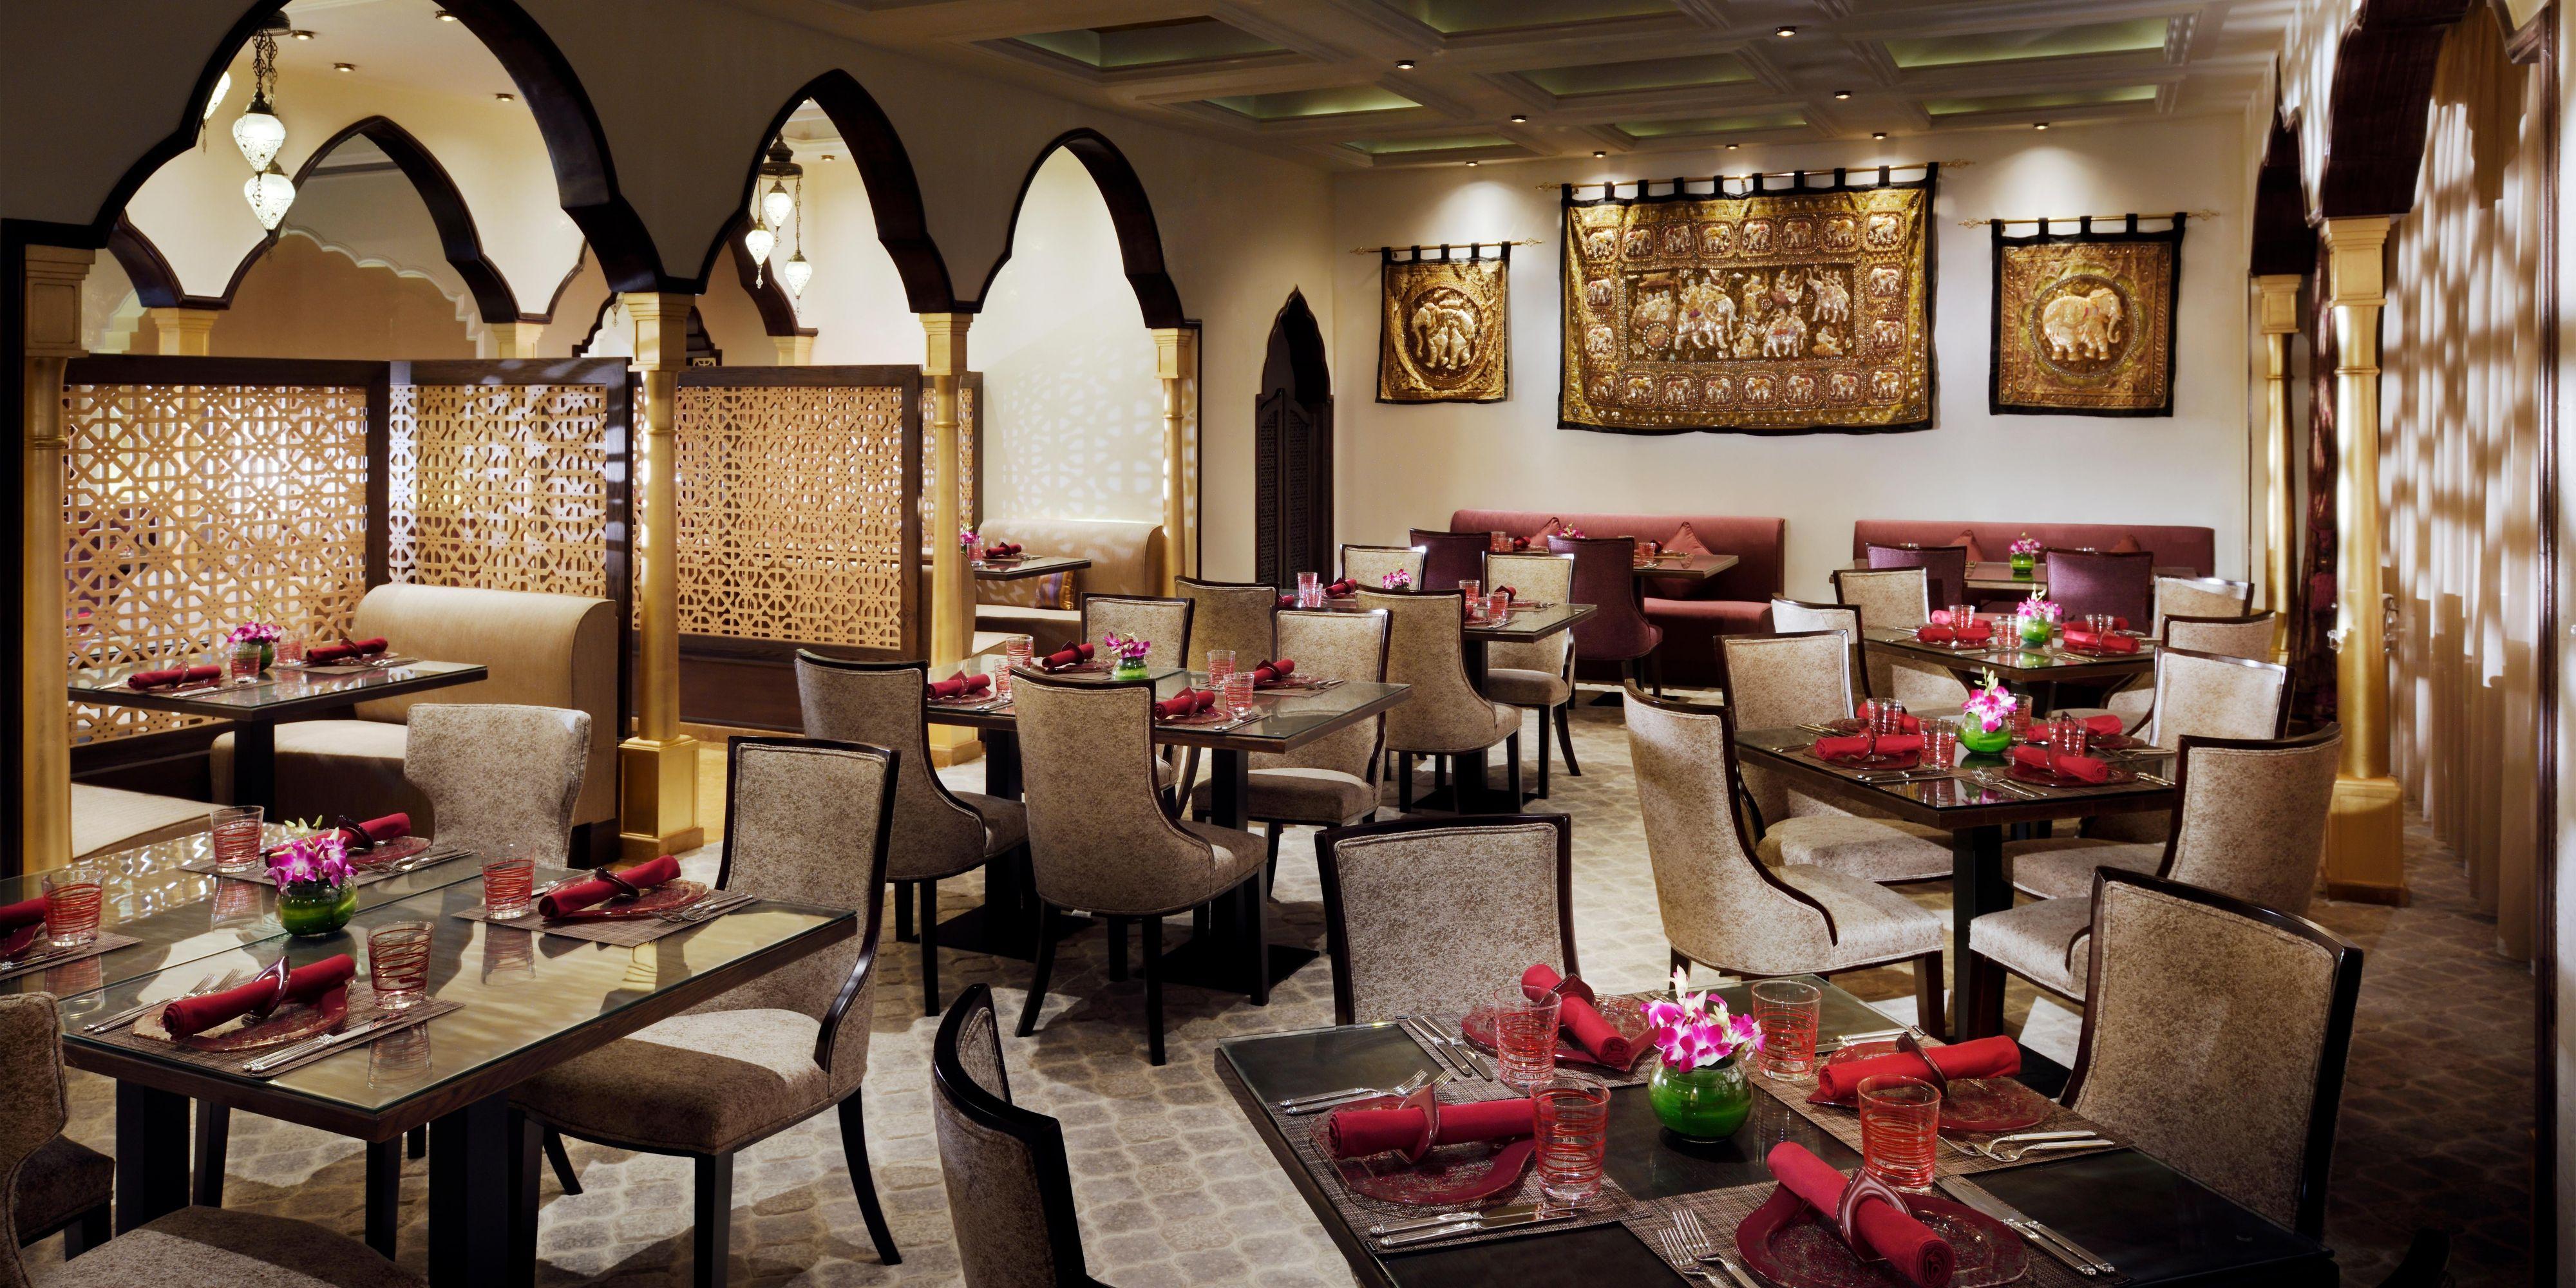 Anardana Indian Restaurant Table Setting and subtle taste of food